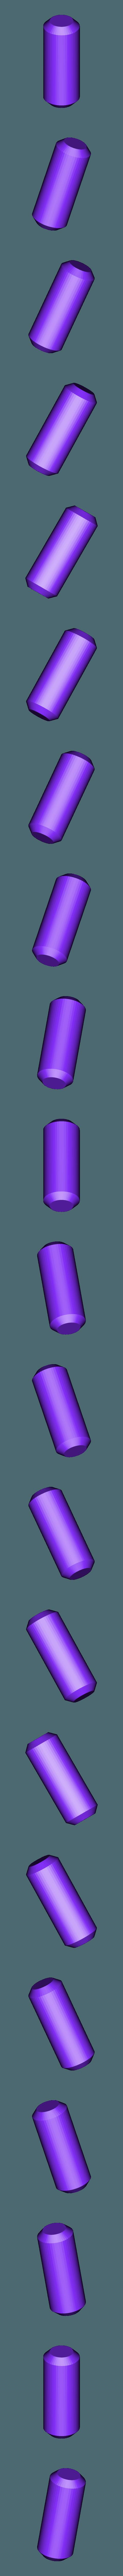 Part1.1-1.STL Download STL file Tracer pulse bomb. • 3D printable design, Cosple